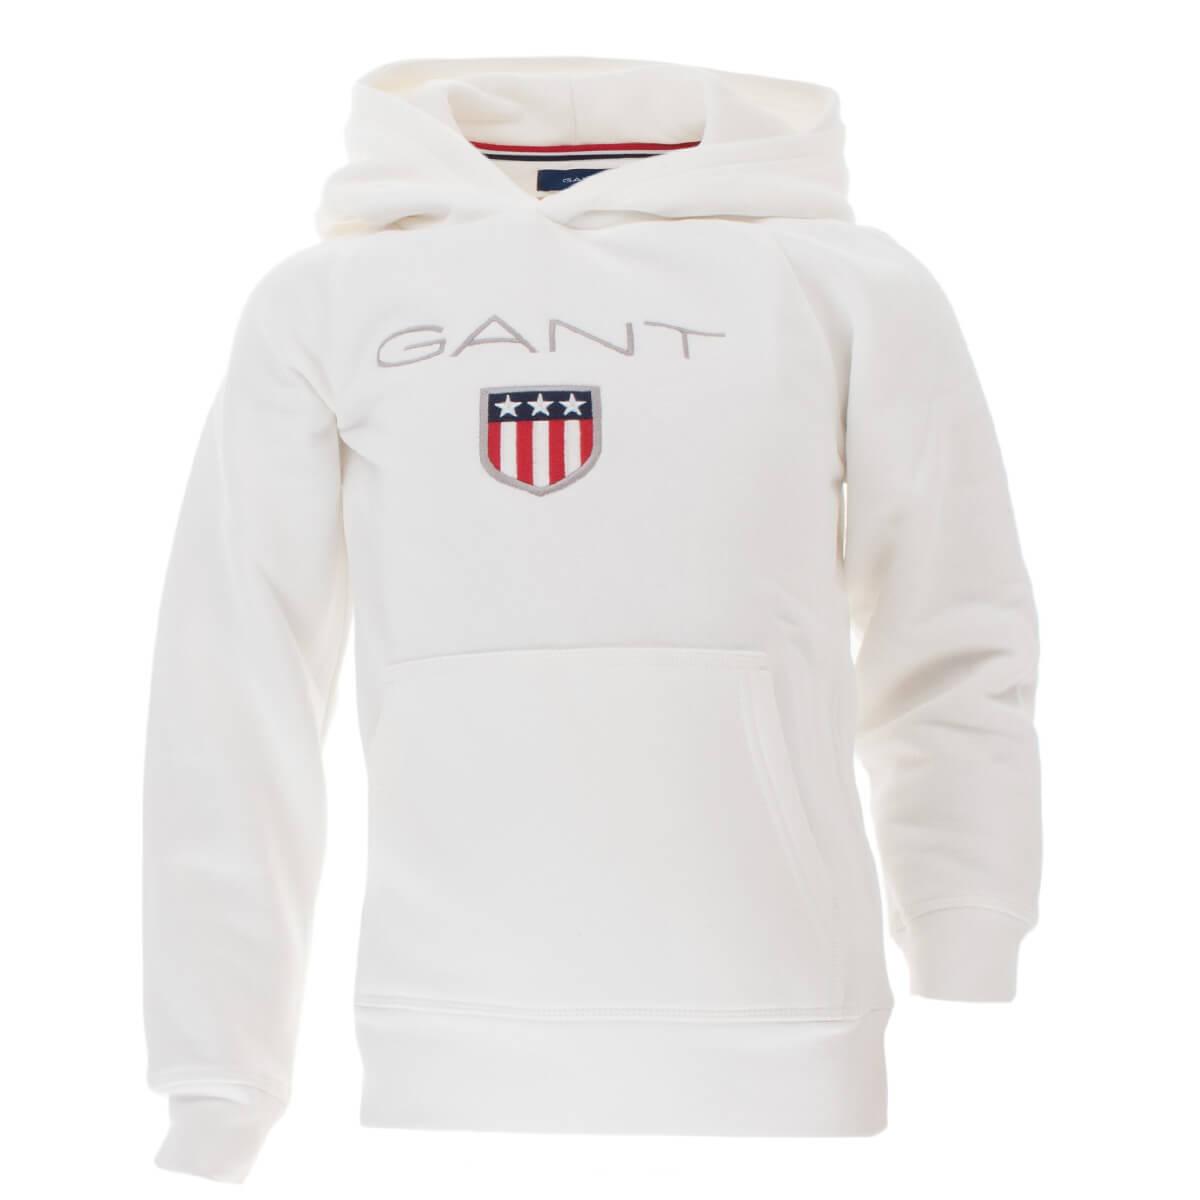 GANT Kinder Unisex Kapuzenpullover Hoodie Shield Logo